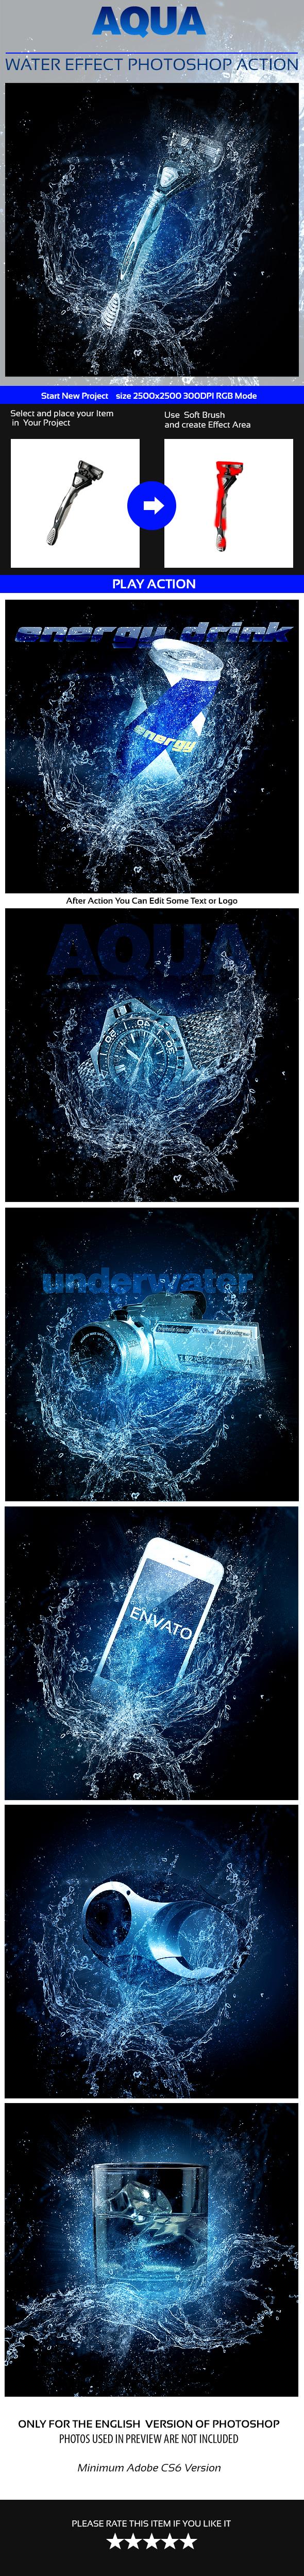 Aqua Photoshop Action - Actions Photoshop